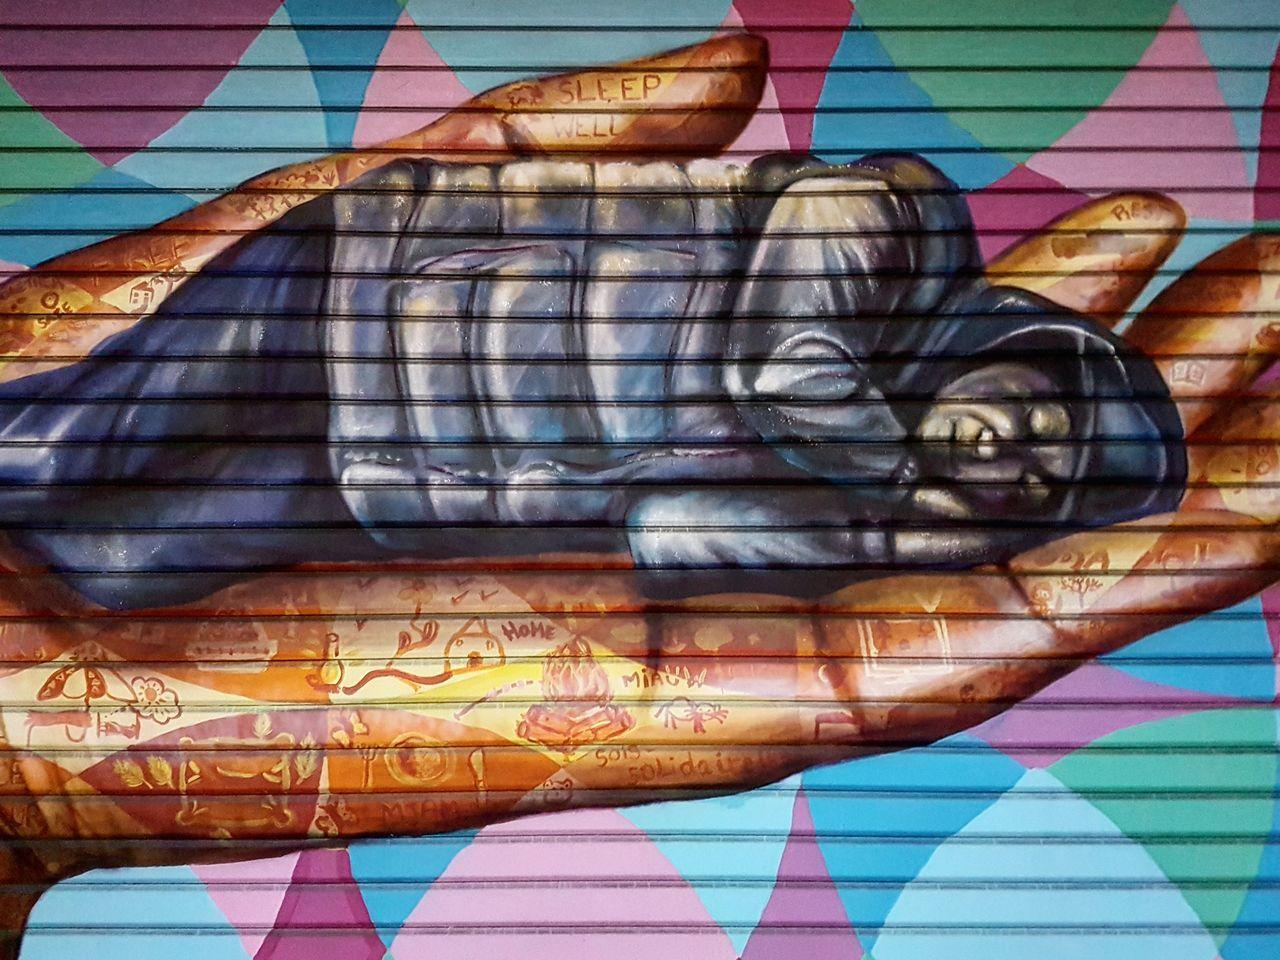 Art And Craft Multi Colored Close-up Fabric No People Tags Graffiti Wall Graffiti Art Walking Street Colours Hand Sleepy Garage